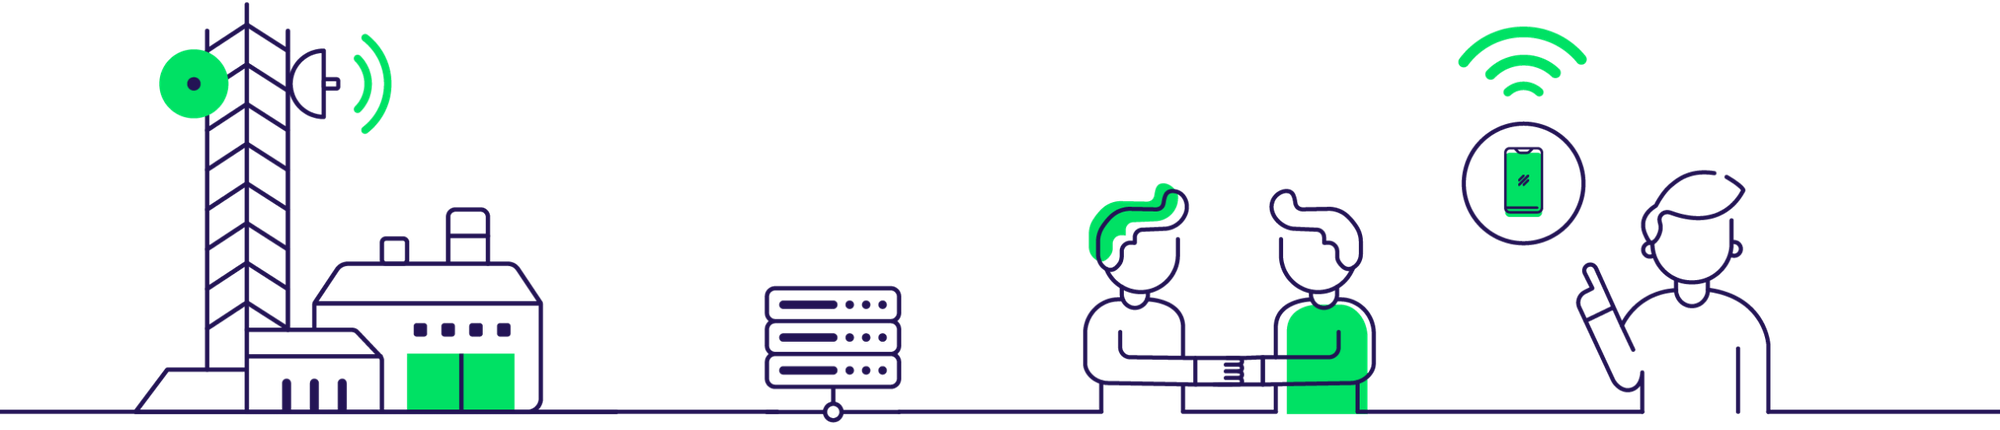 Dessin infrastructures et utilisateurs